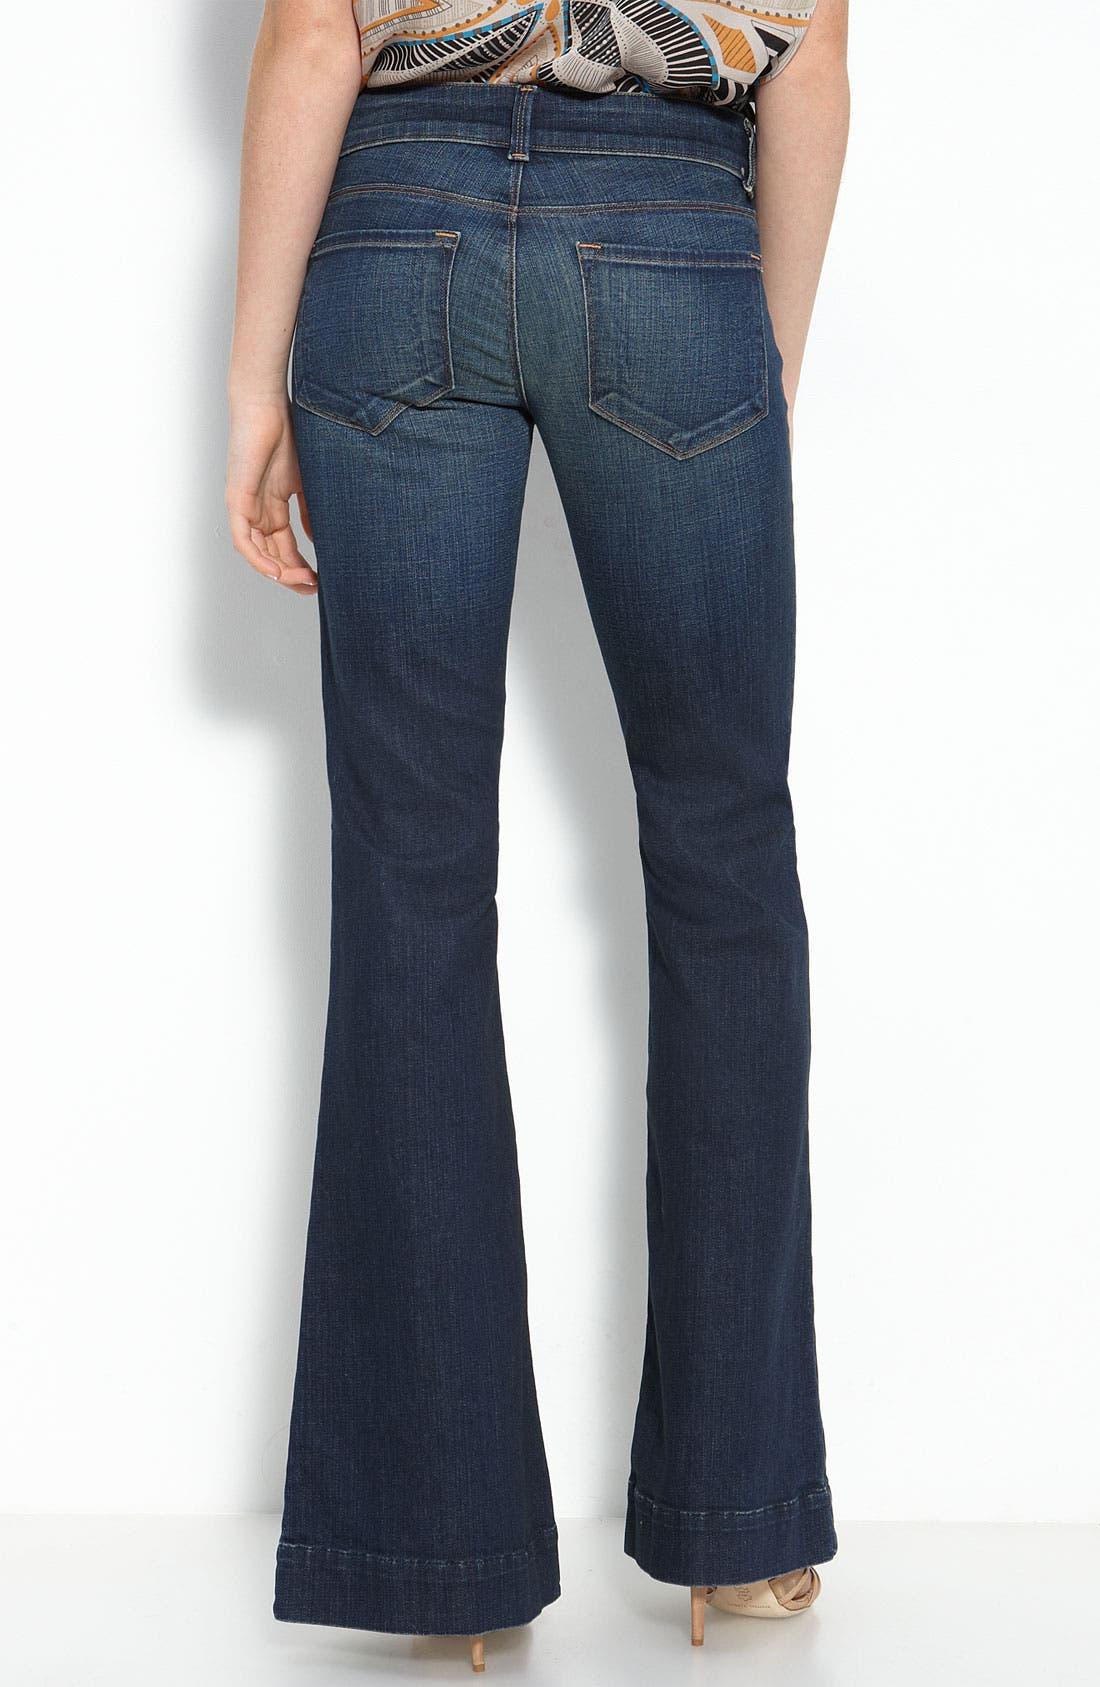 Main Image - J Brand 'Lovestory' Low Rise Bell Bottom Stretch Jeans (Dark Vintage Wash)